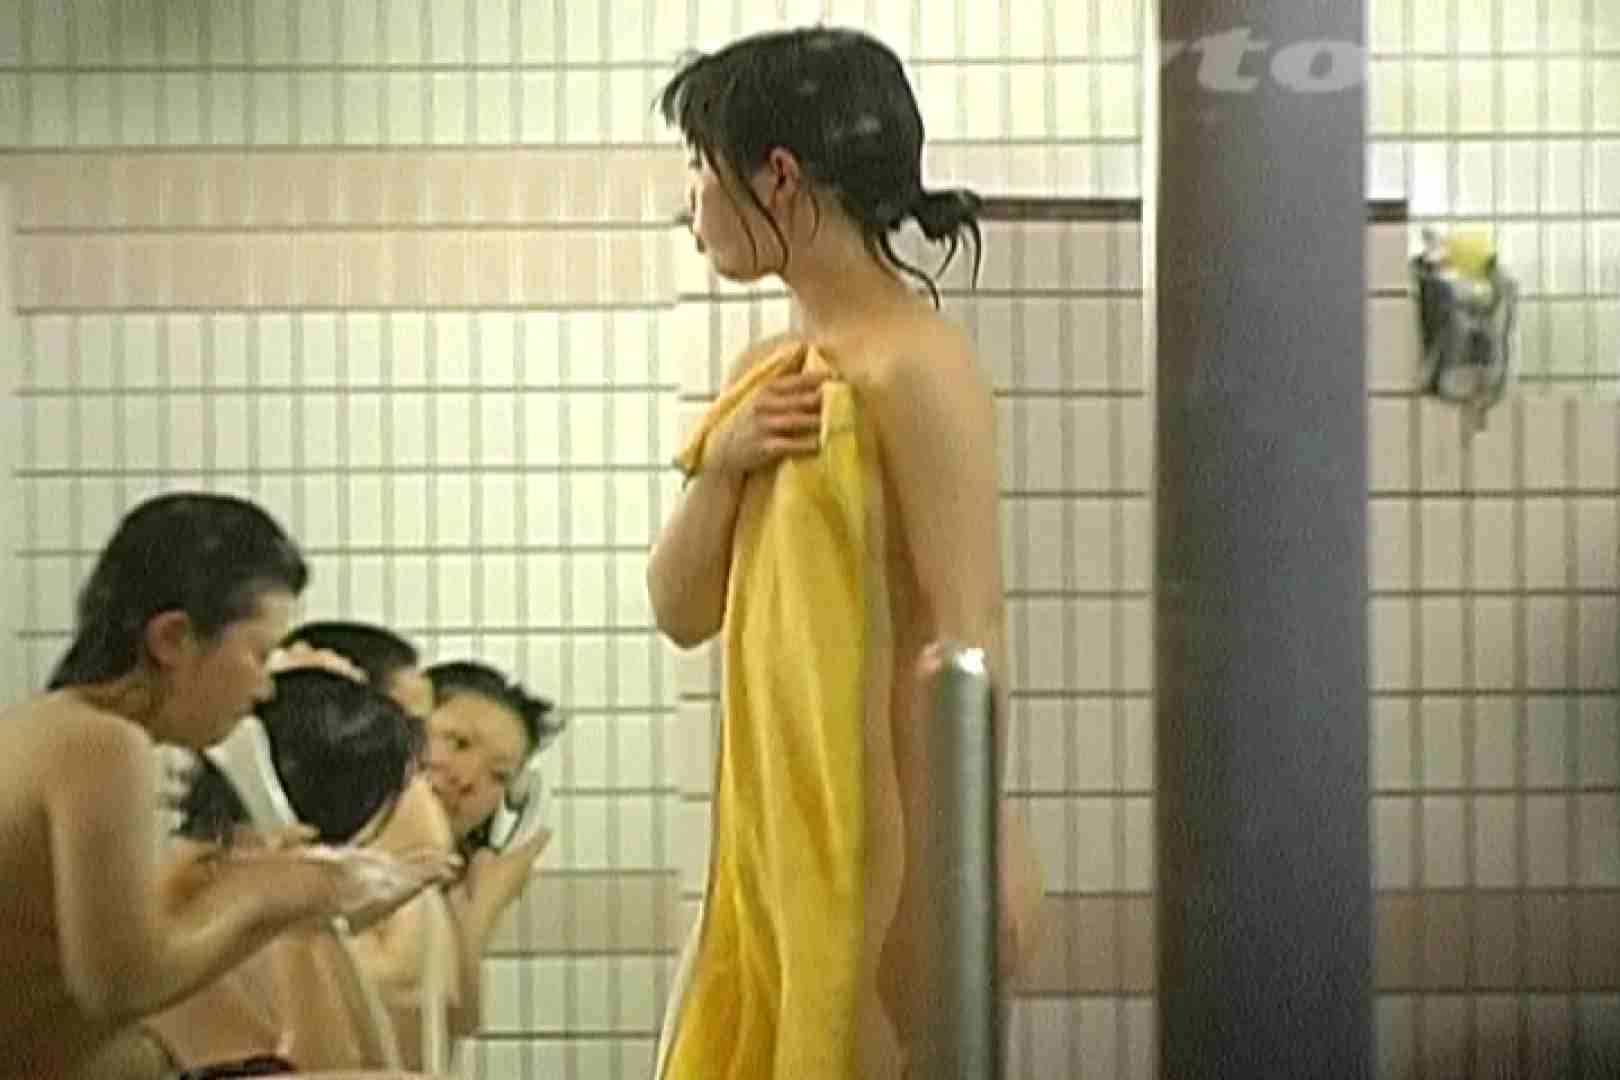 ▲復活限定▲合宿ホテル女風呂盗撮 Vol.27 合宿中の出来事 性交動画流出 95画像 70